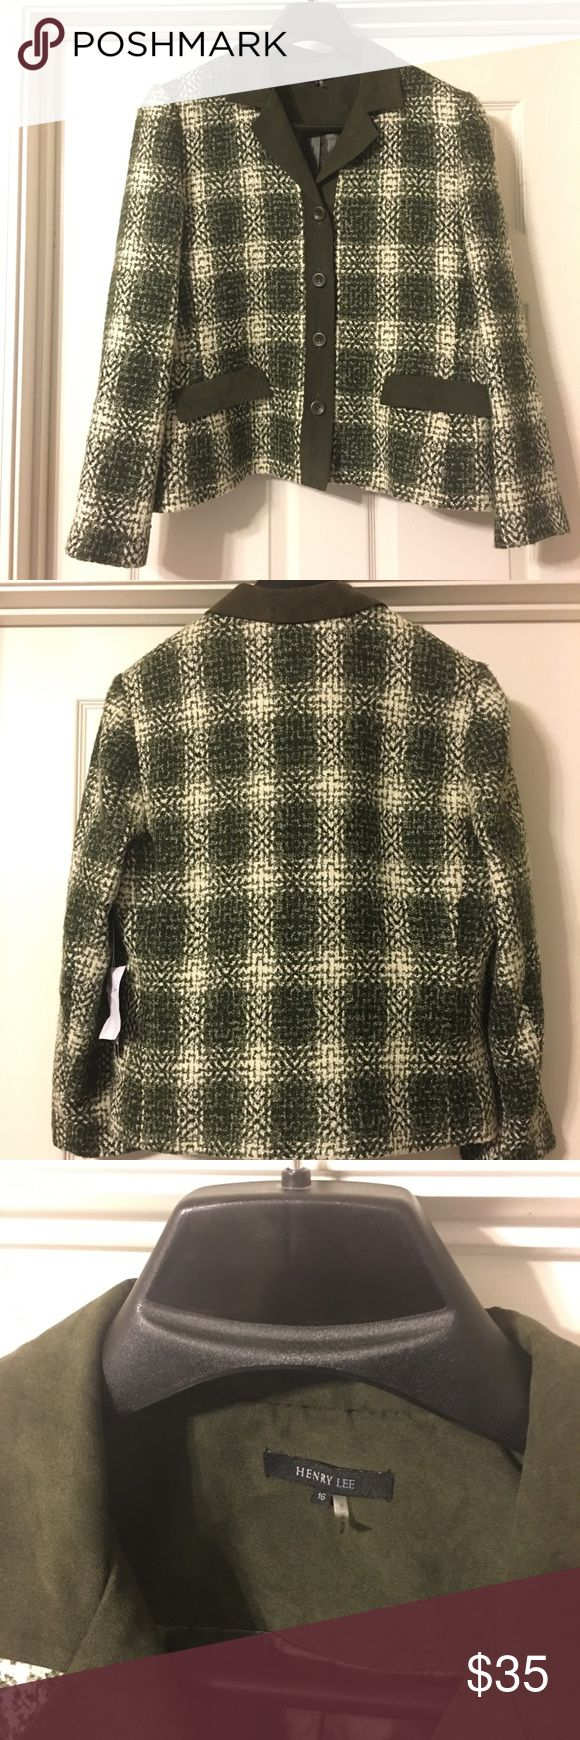 Henry Lee Tweed Olive & White Blazer Henry Lee Tweed Olive & White Blazer Size 16 Brand New with tags. Tweed jacket with inside lining. Henry Lee Jackets & Coats Blazers